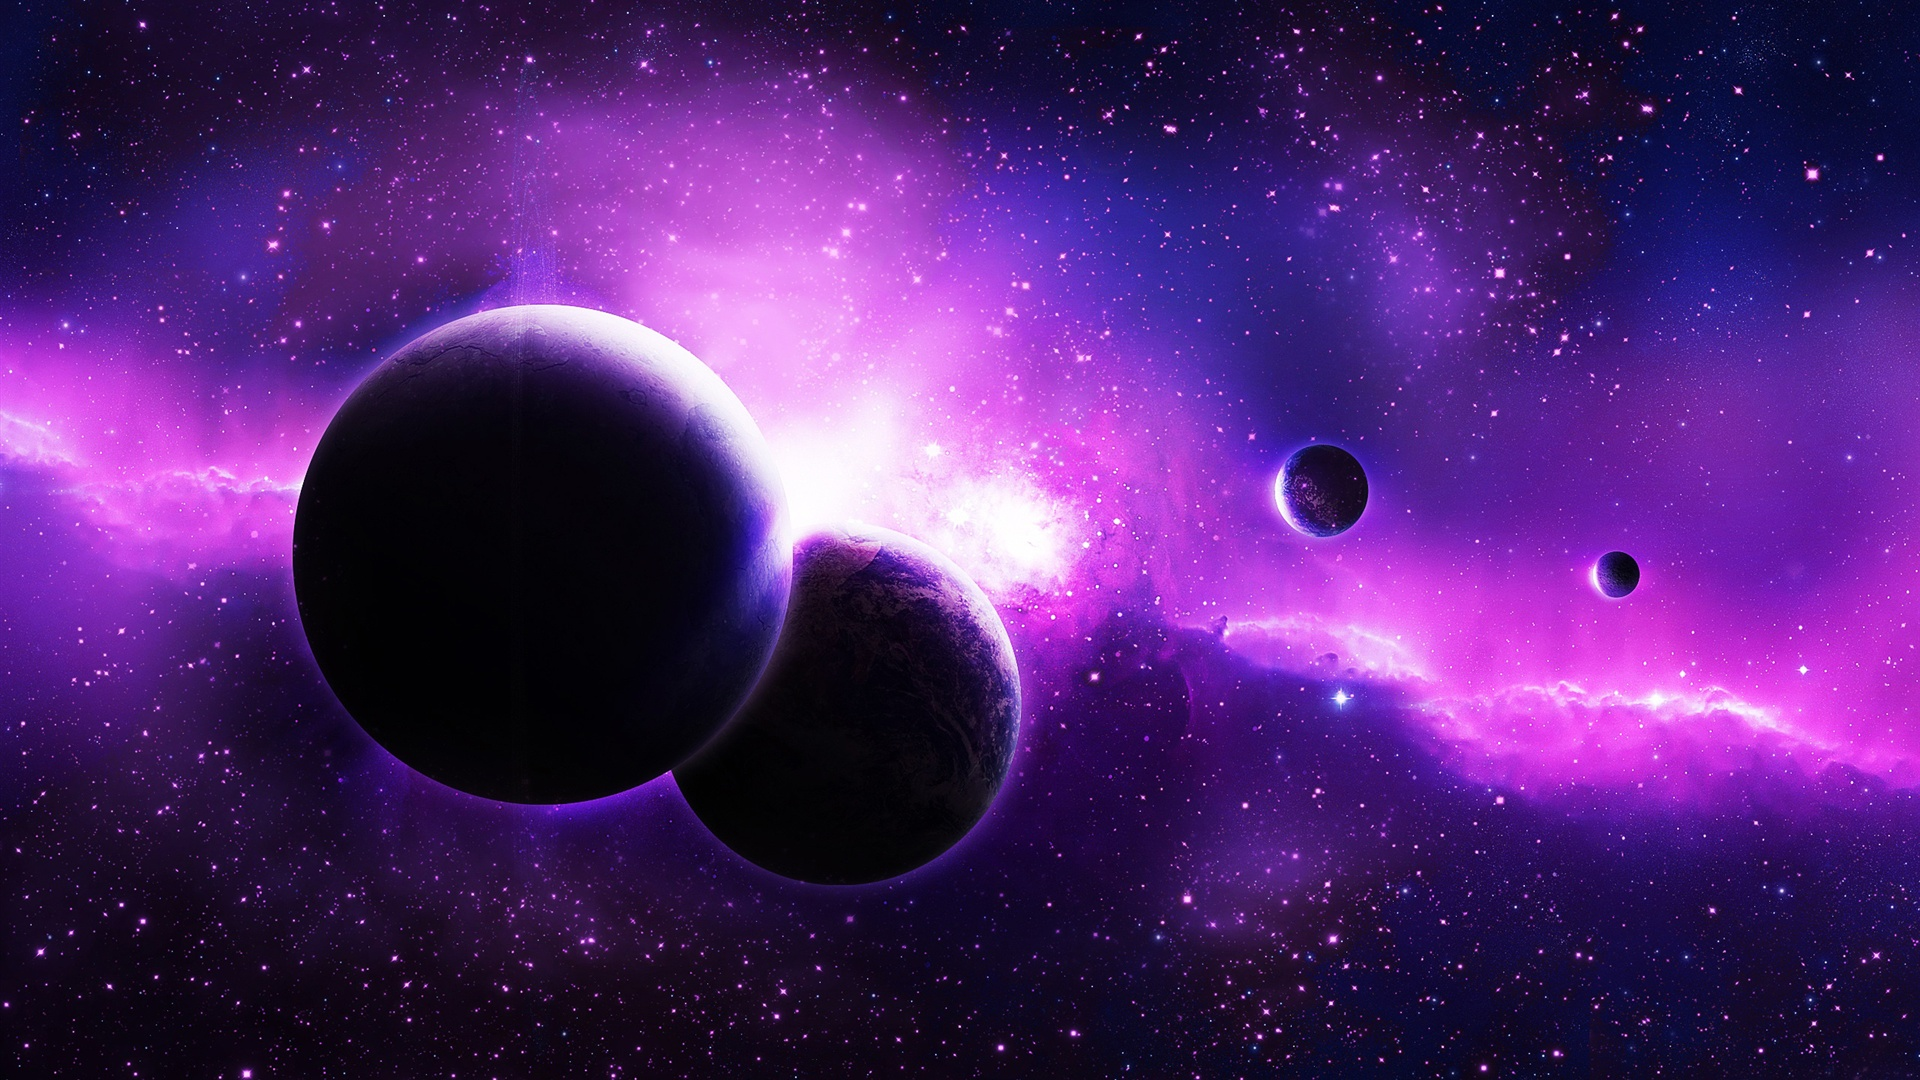 Planetas p rpura espacio estrellas fondos de pantalla for 1800 x 1200 window